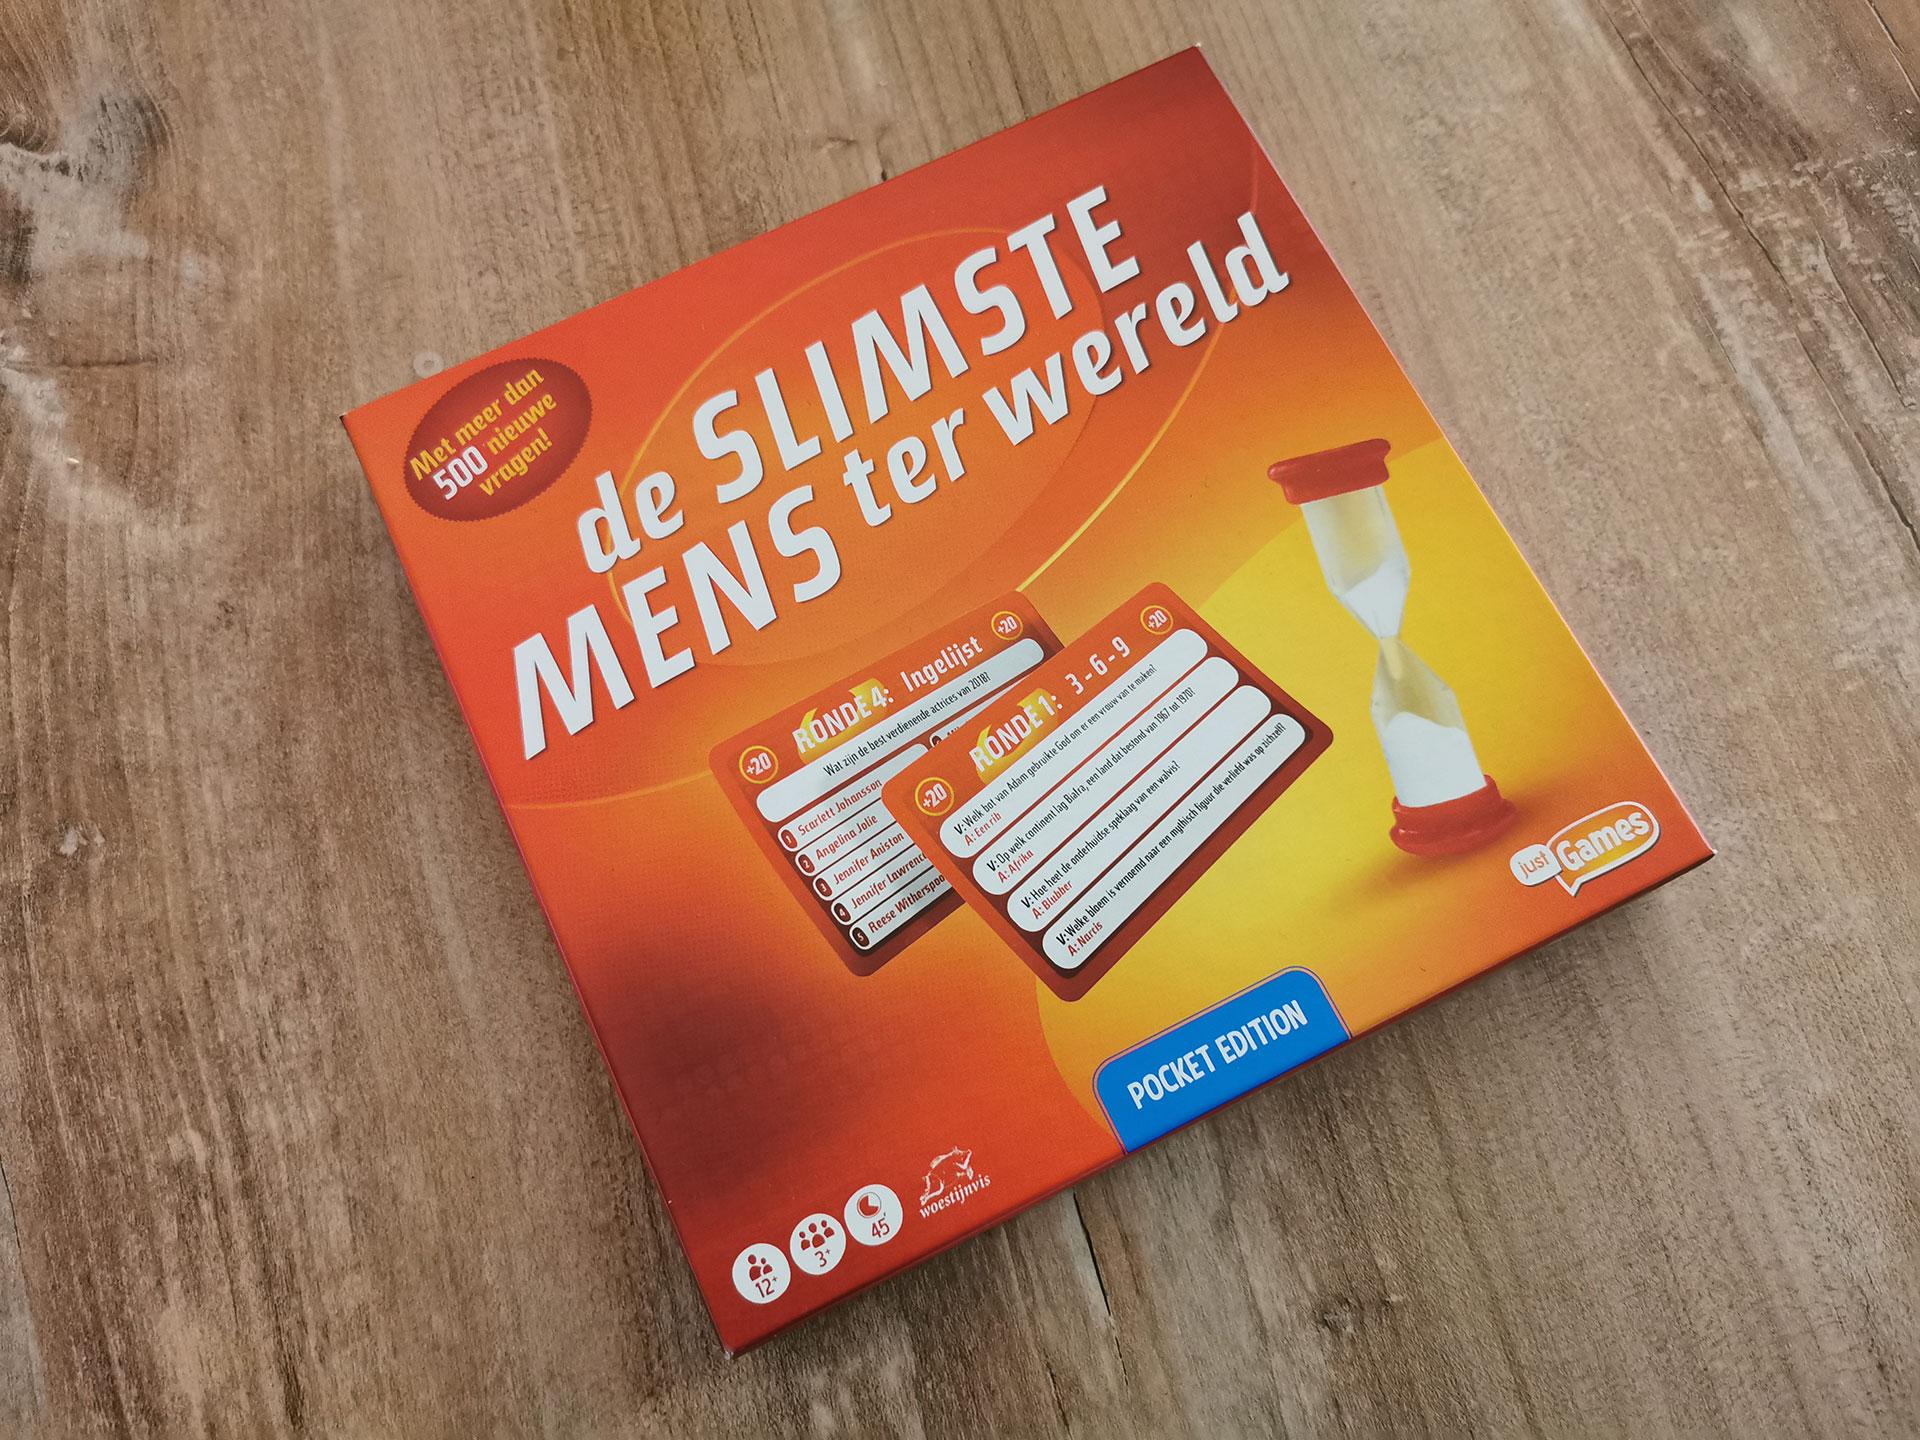 De Slimste Mens Pocket Edition Verpakking